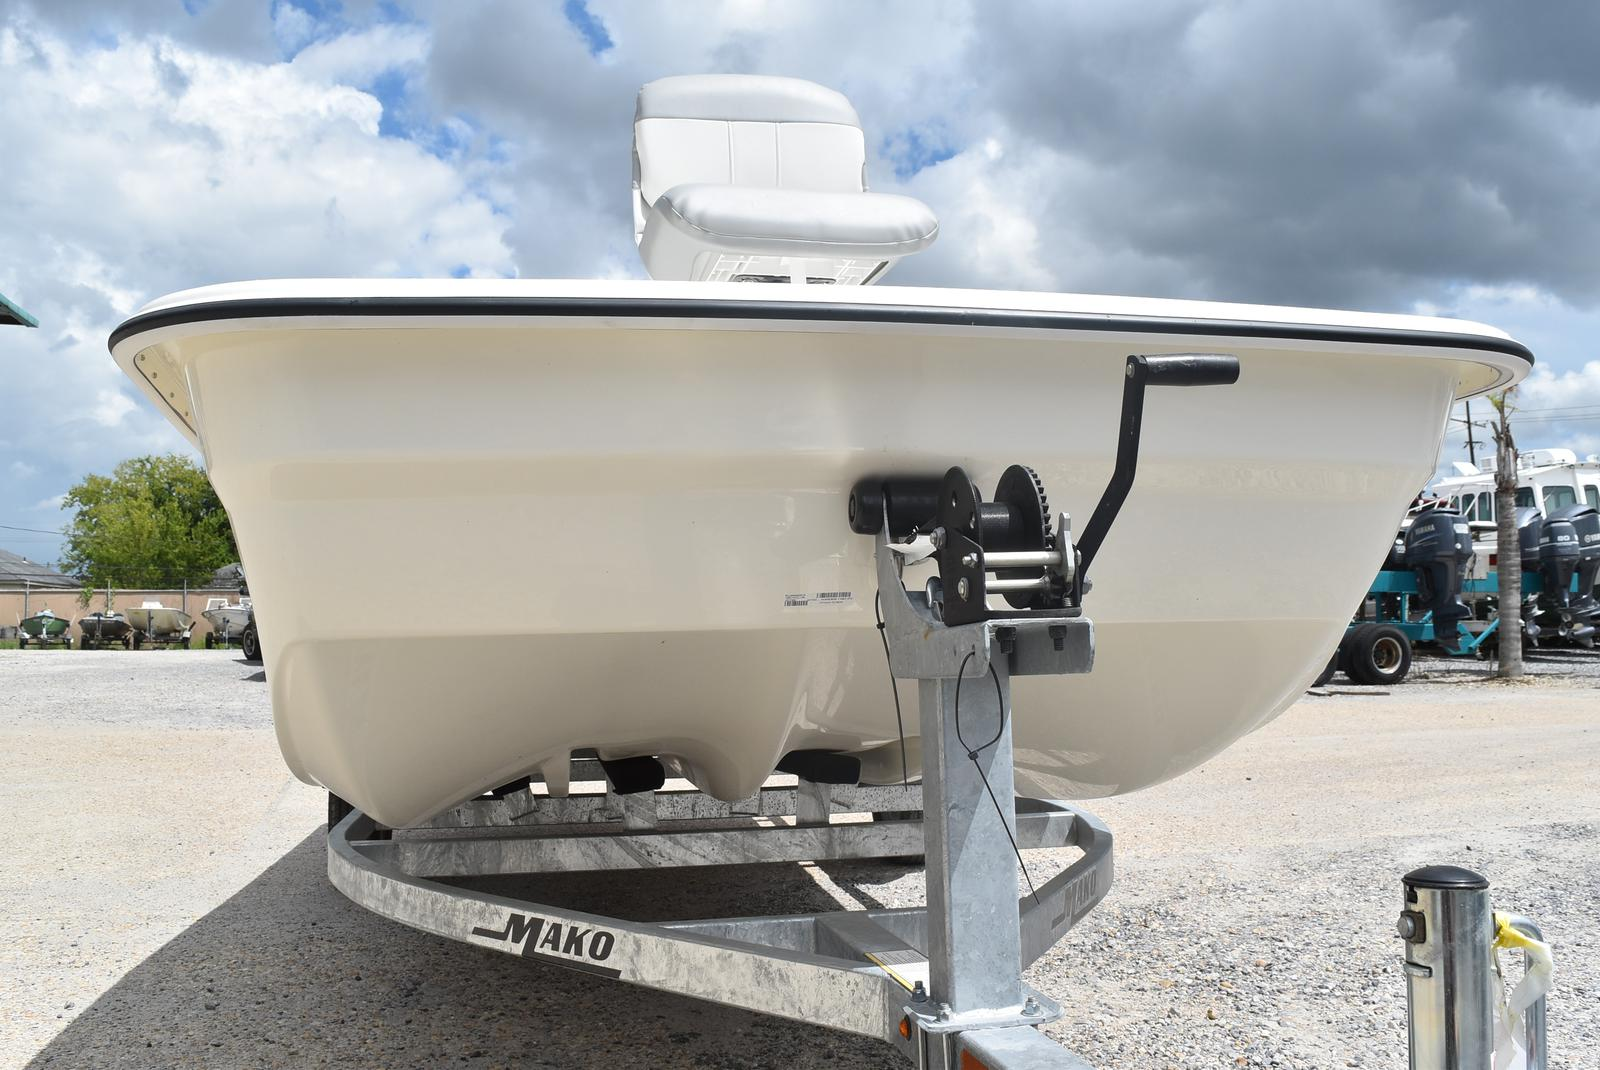 2020 Mako boat for sale, model of the boat is Pro Skiff 17, 75 ELPT & Image # 5 of 9